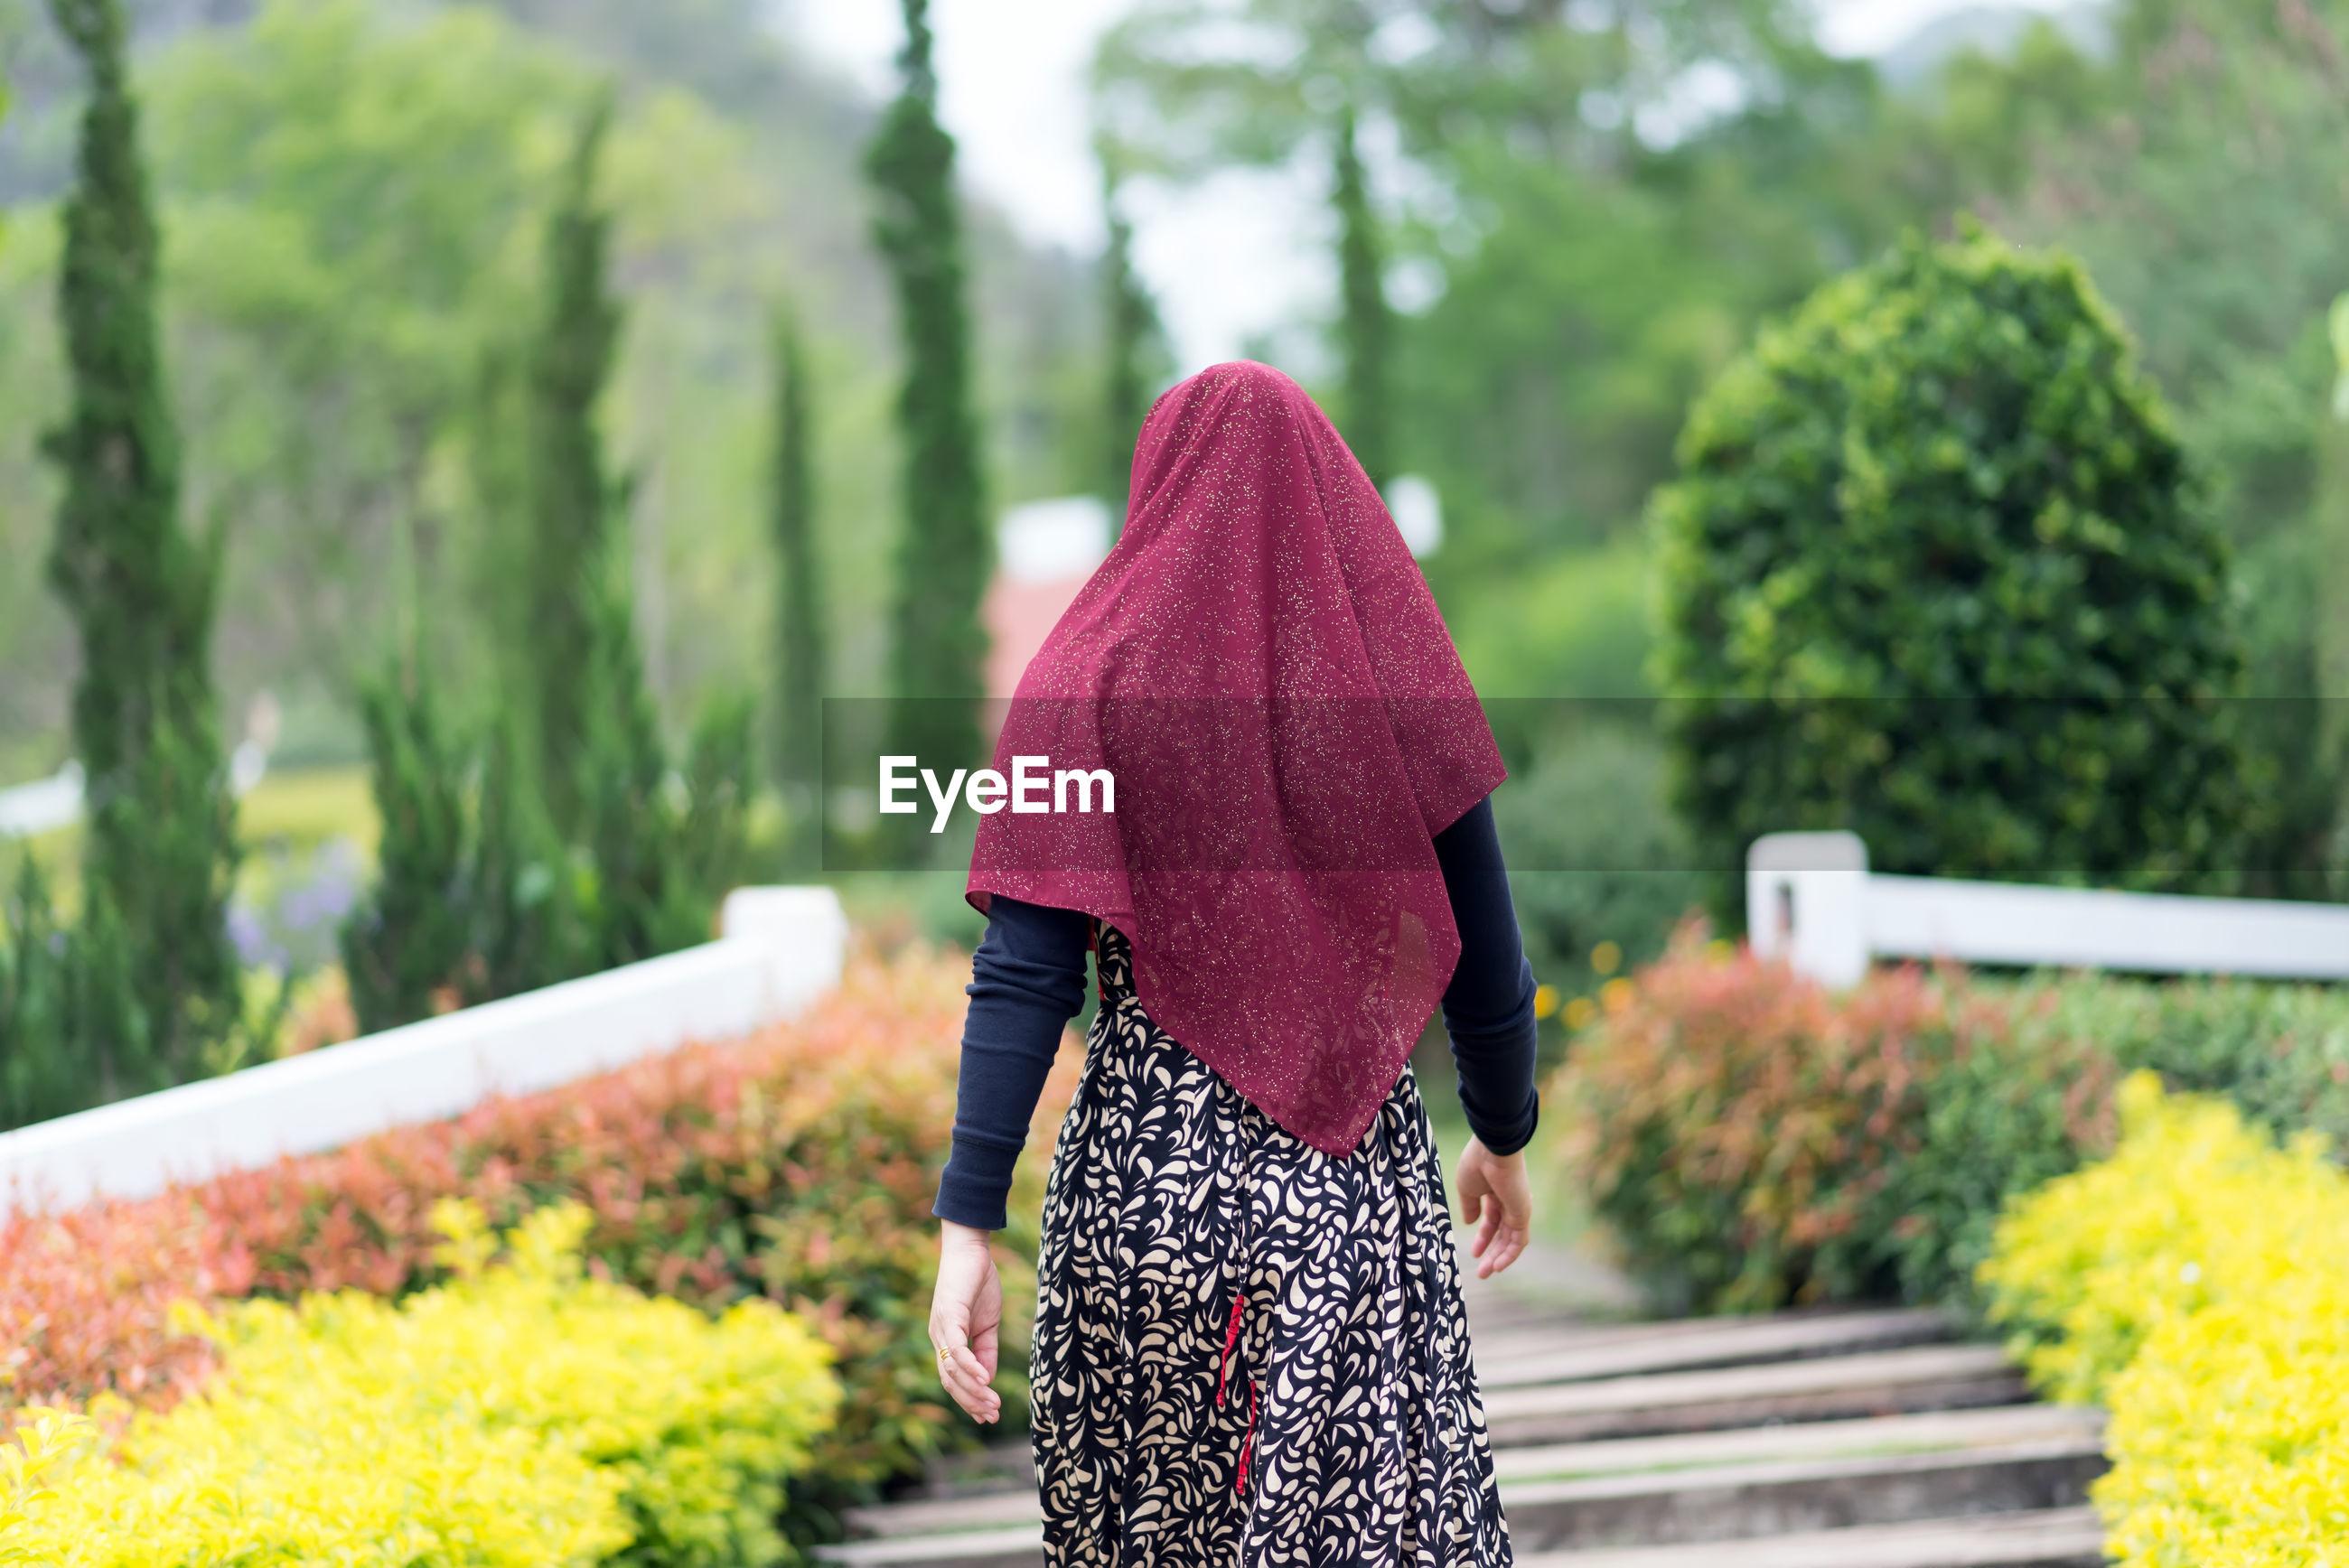 Rear view of woman in hijab walking at park